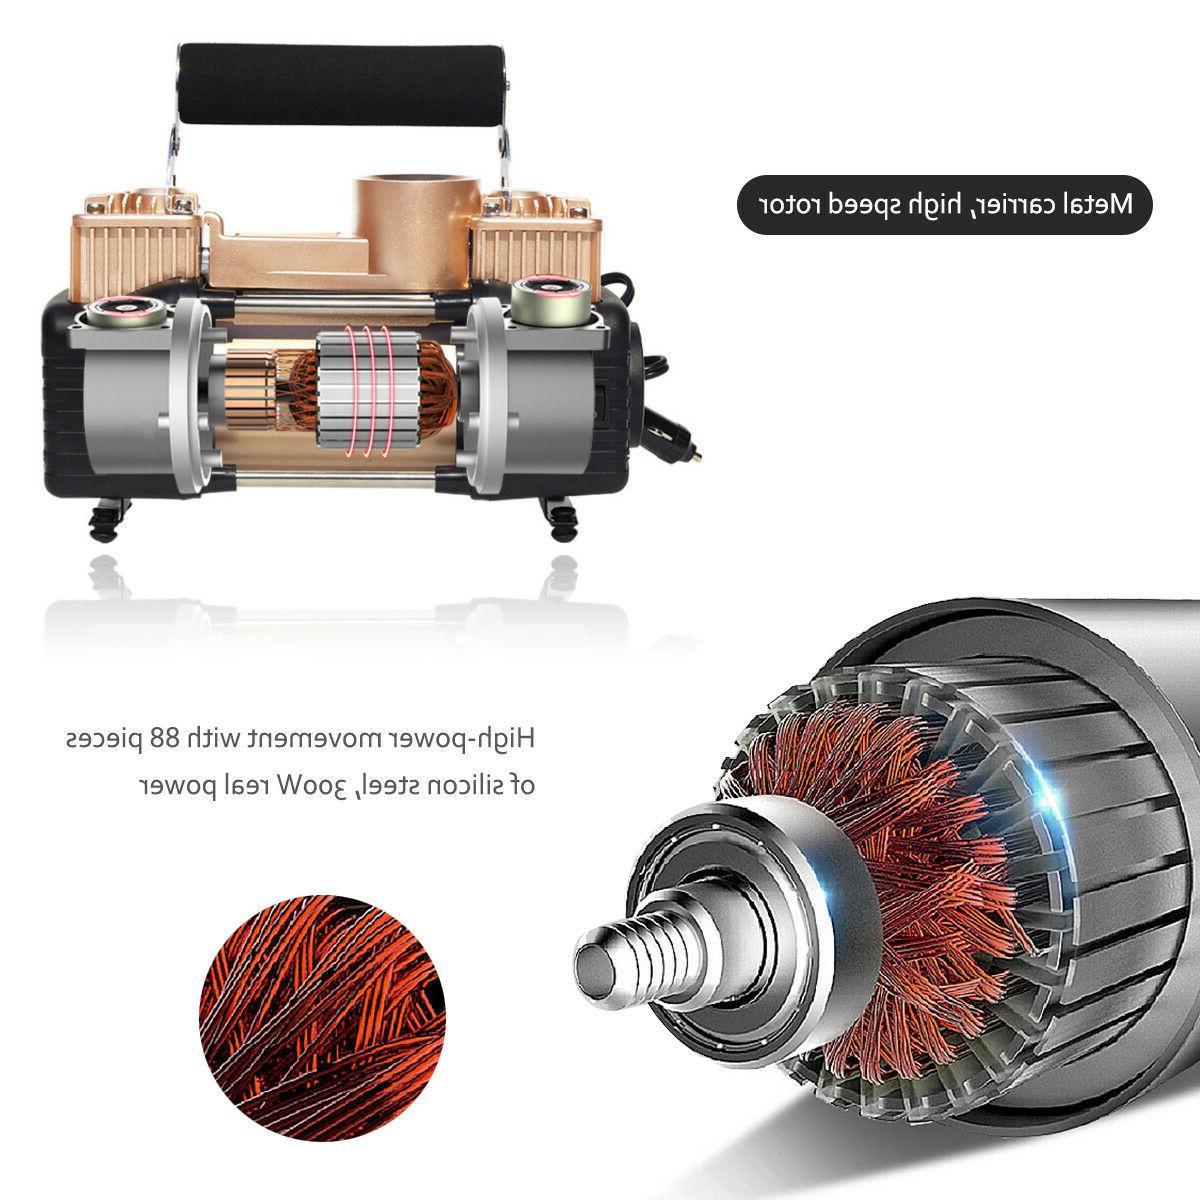 Heavy 12V Portable 150PSI Tire Inflator Compressor